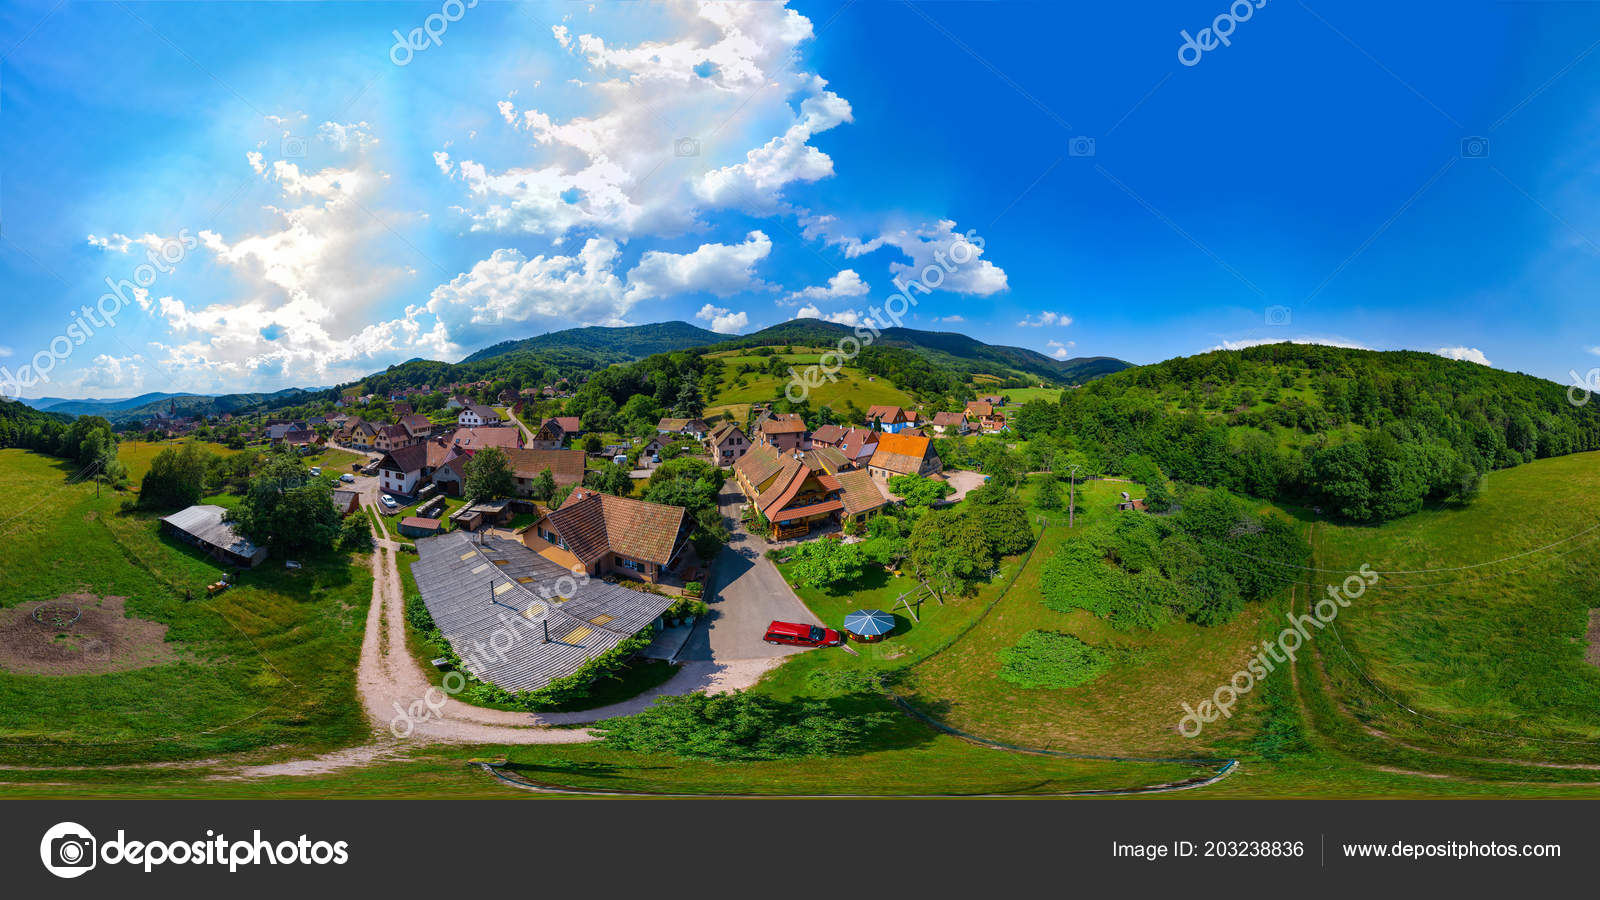 360 Degree Spherical Panoramic View Little Village Breitenbach